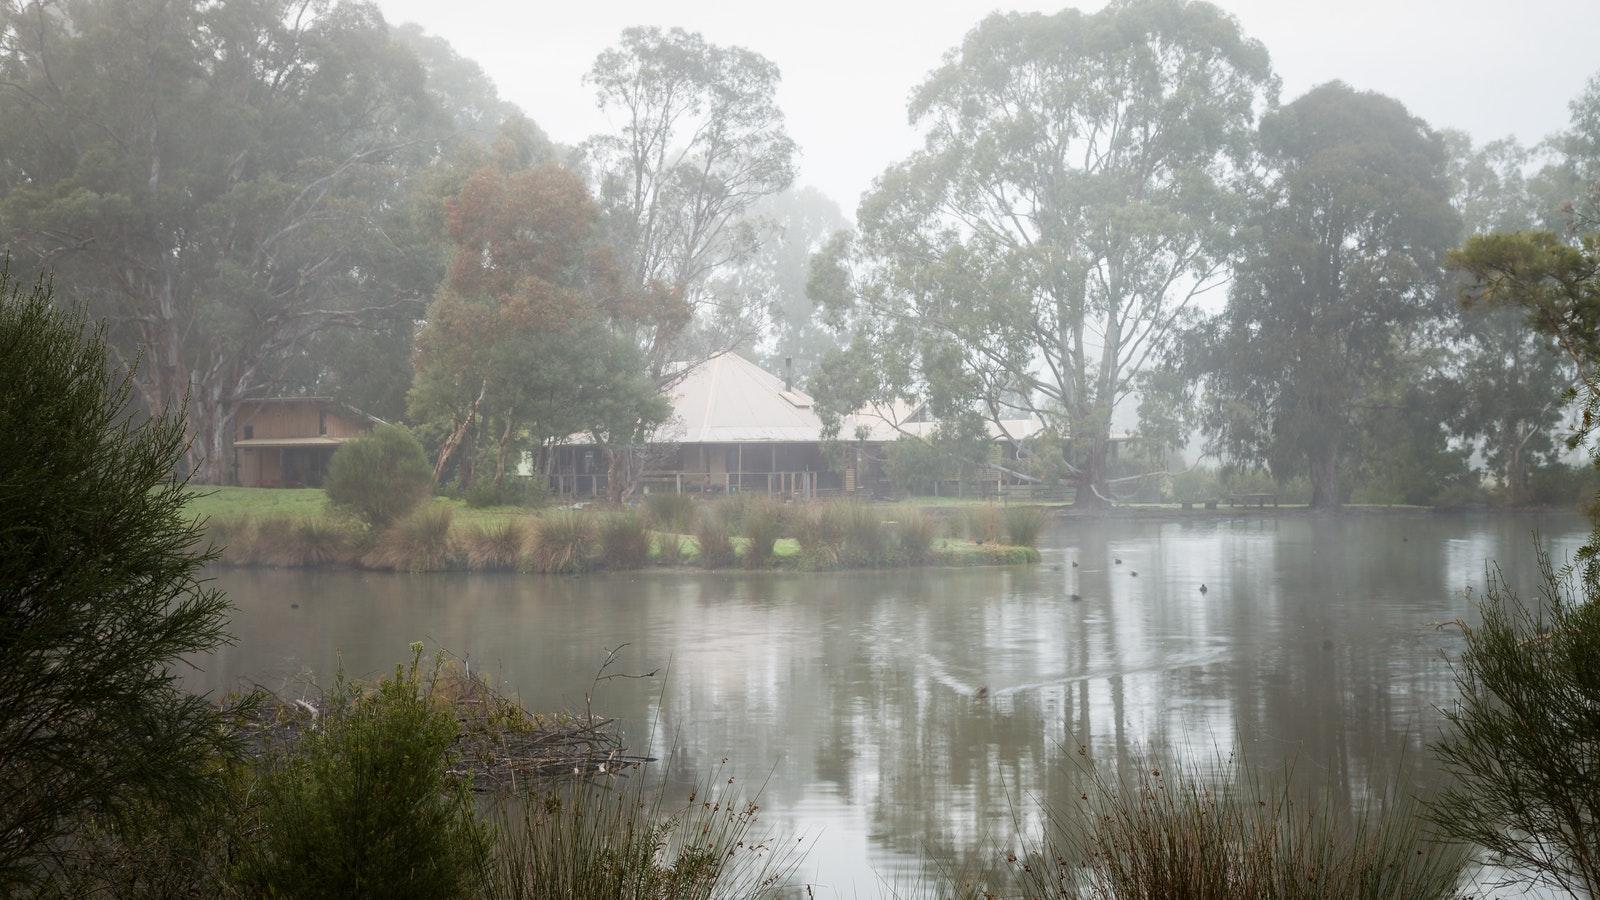 Misty morning over the billabong